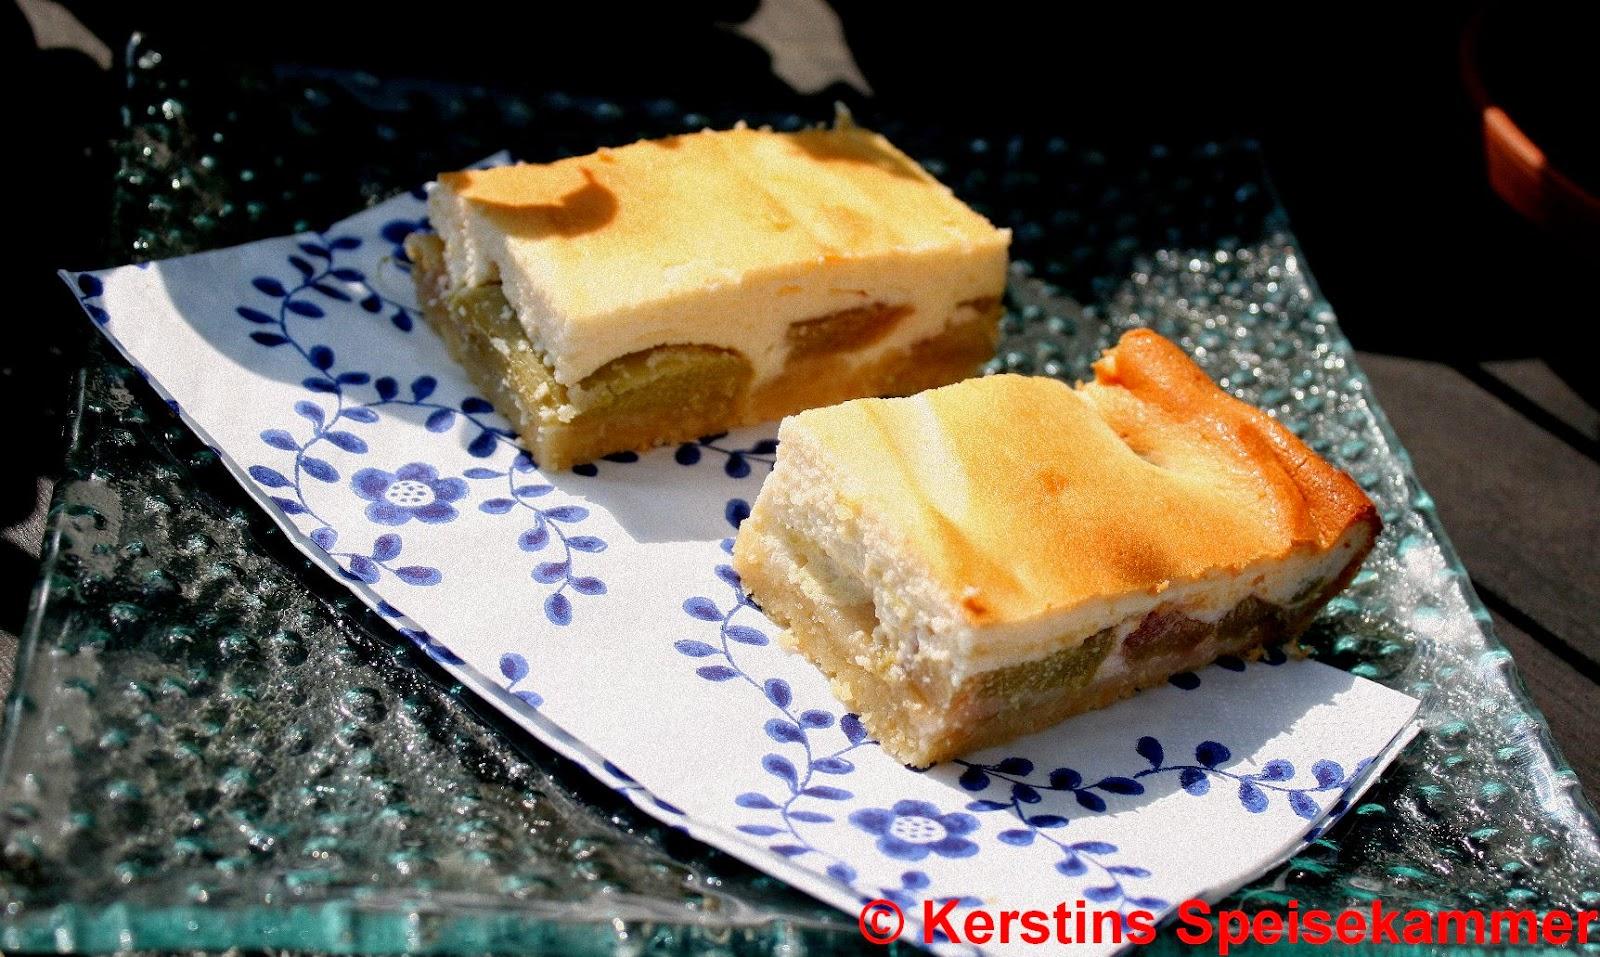 Kerstins Speisekammer Rhabarber Quark Kuchen